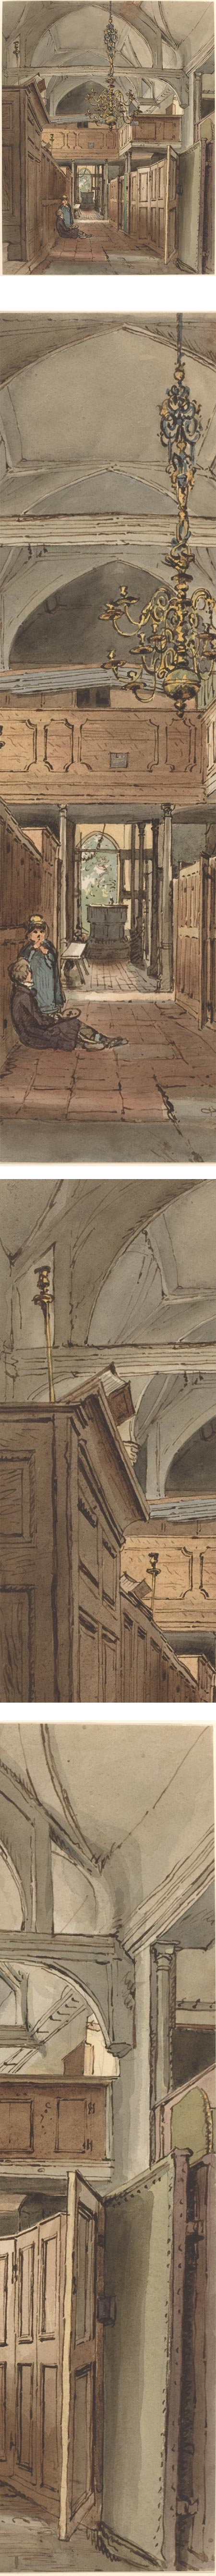 Interior of Bushey Church, William Henry Hunt